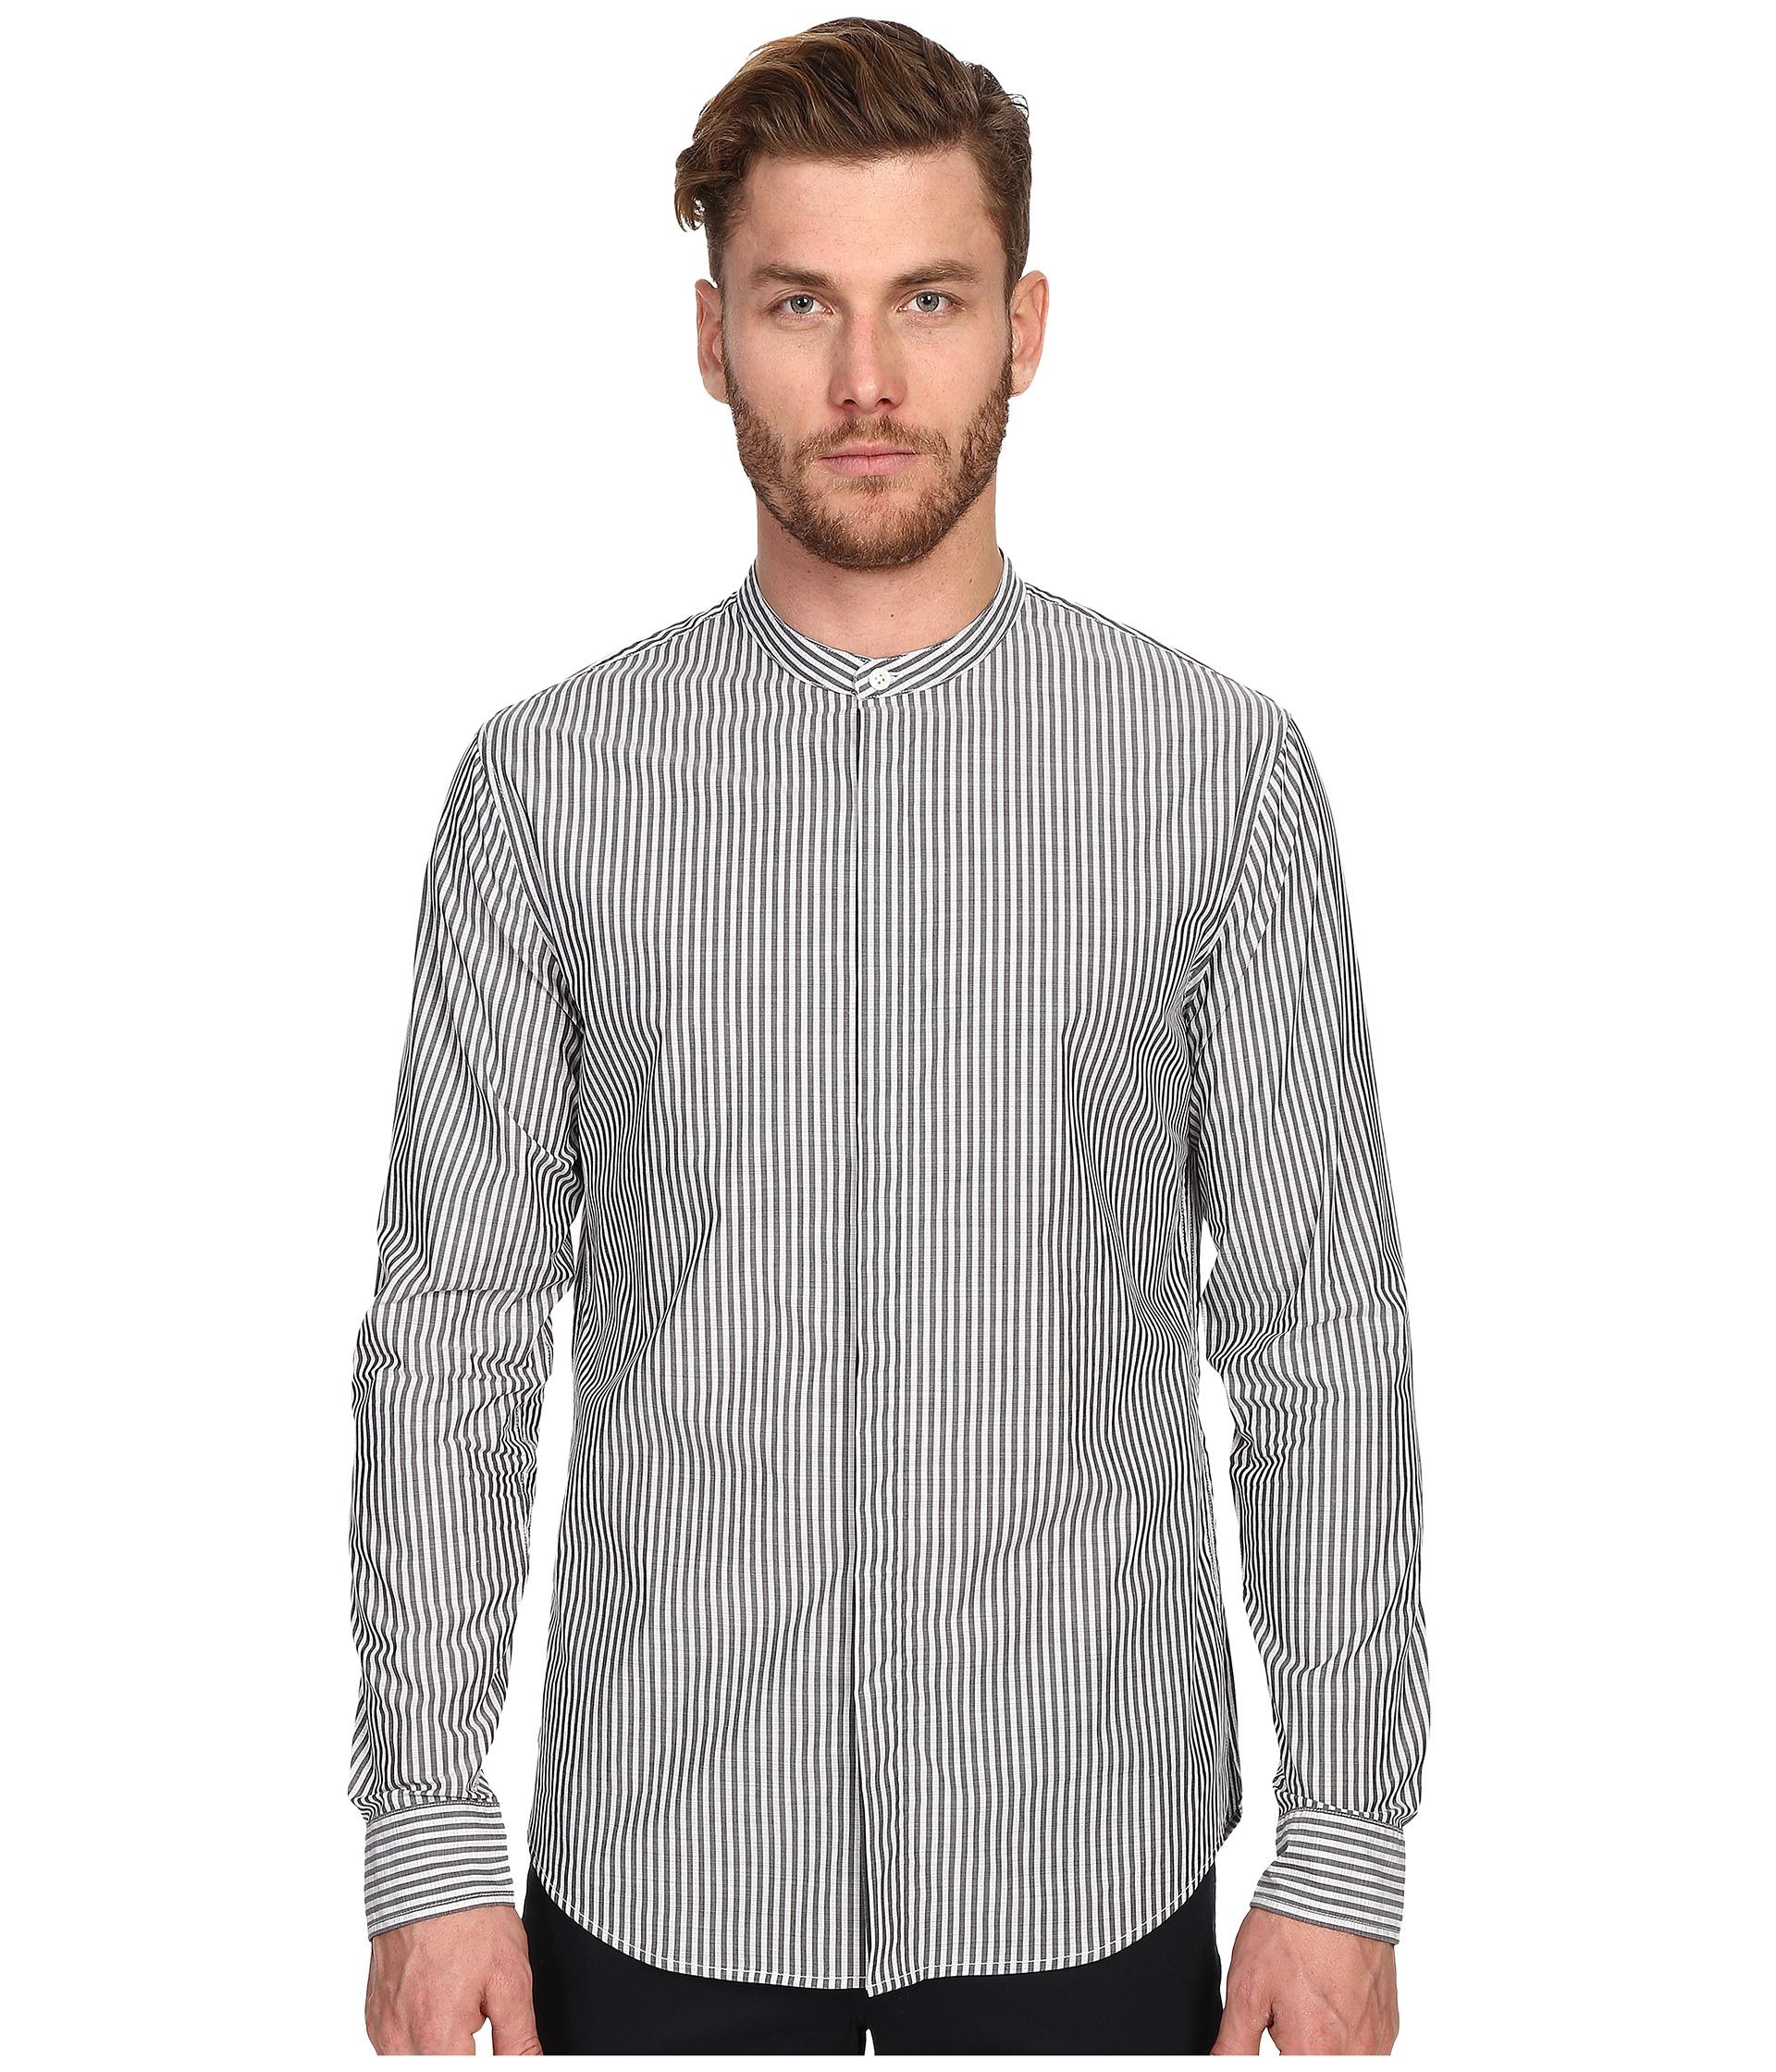 mandarin collar shirt - Black Vince Free Shipping Good Selling 100% Original Cheap Online vX7ZlcZL